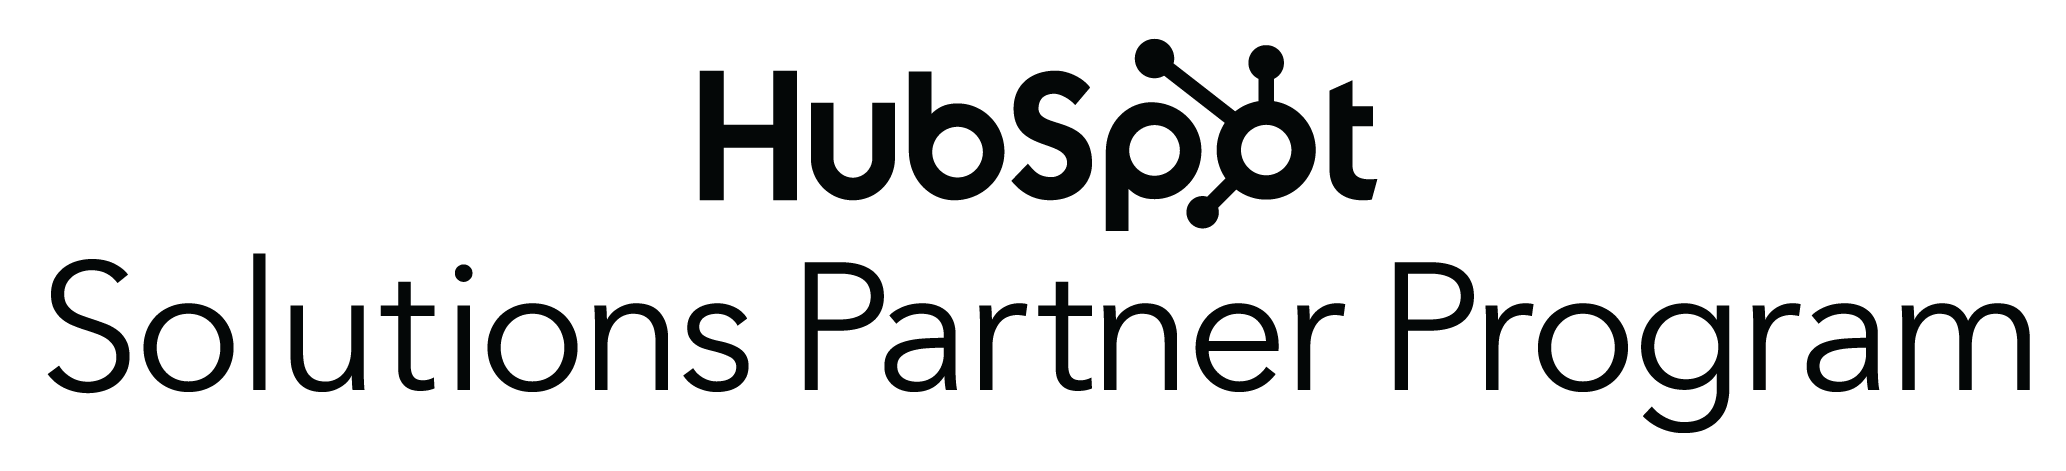 solutionspartnerprogram-analytics that profit